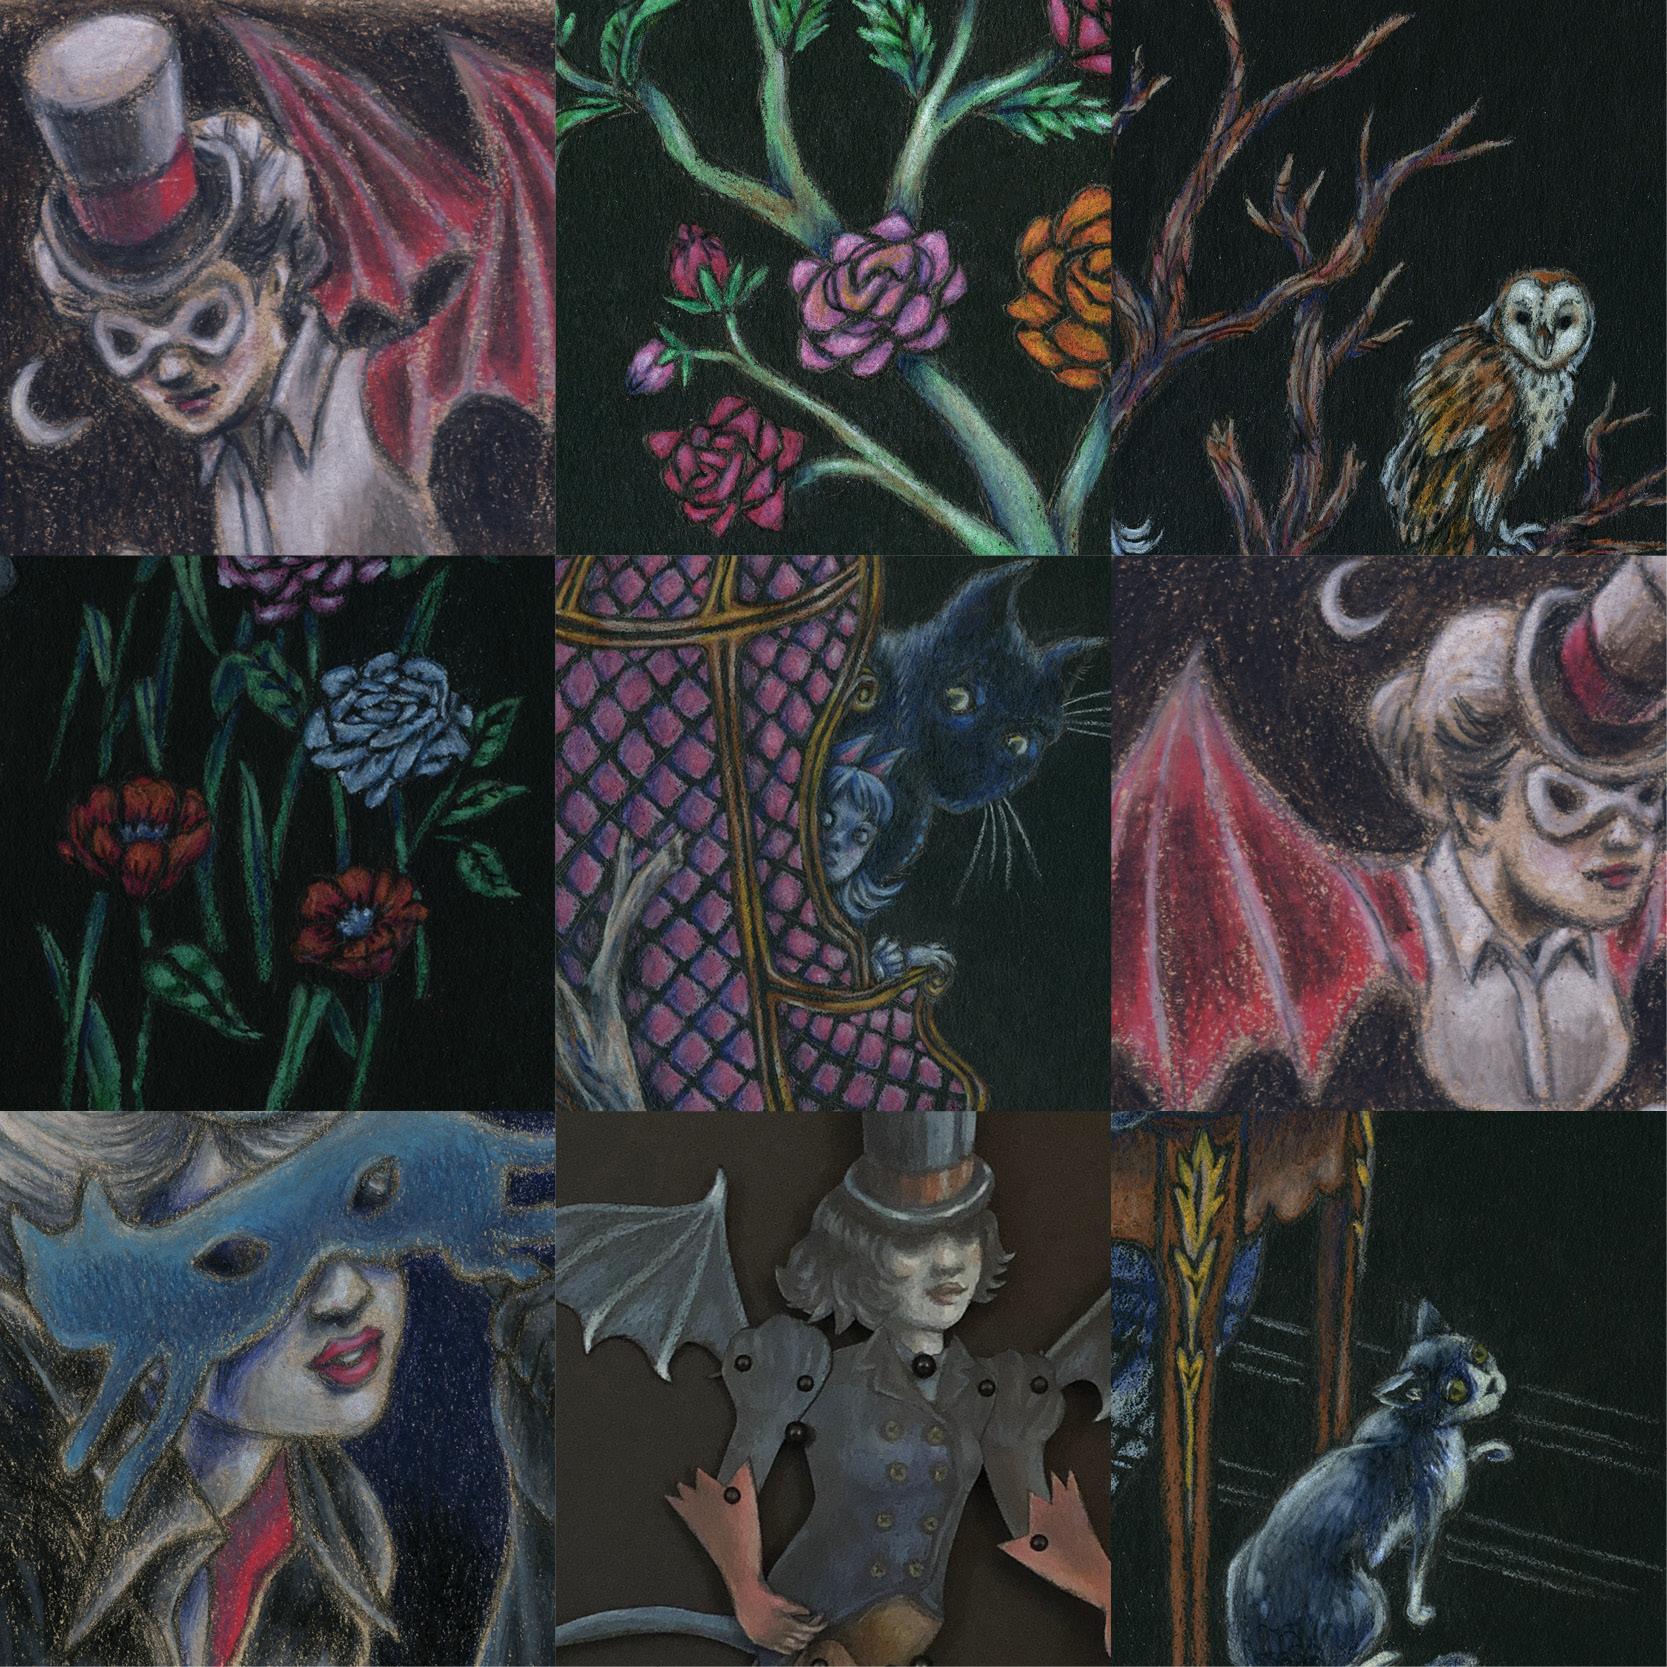 9x9 Collage-Art From the Strange Land-Melissa Kojima.jpg